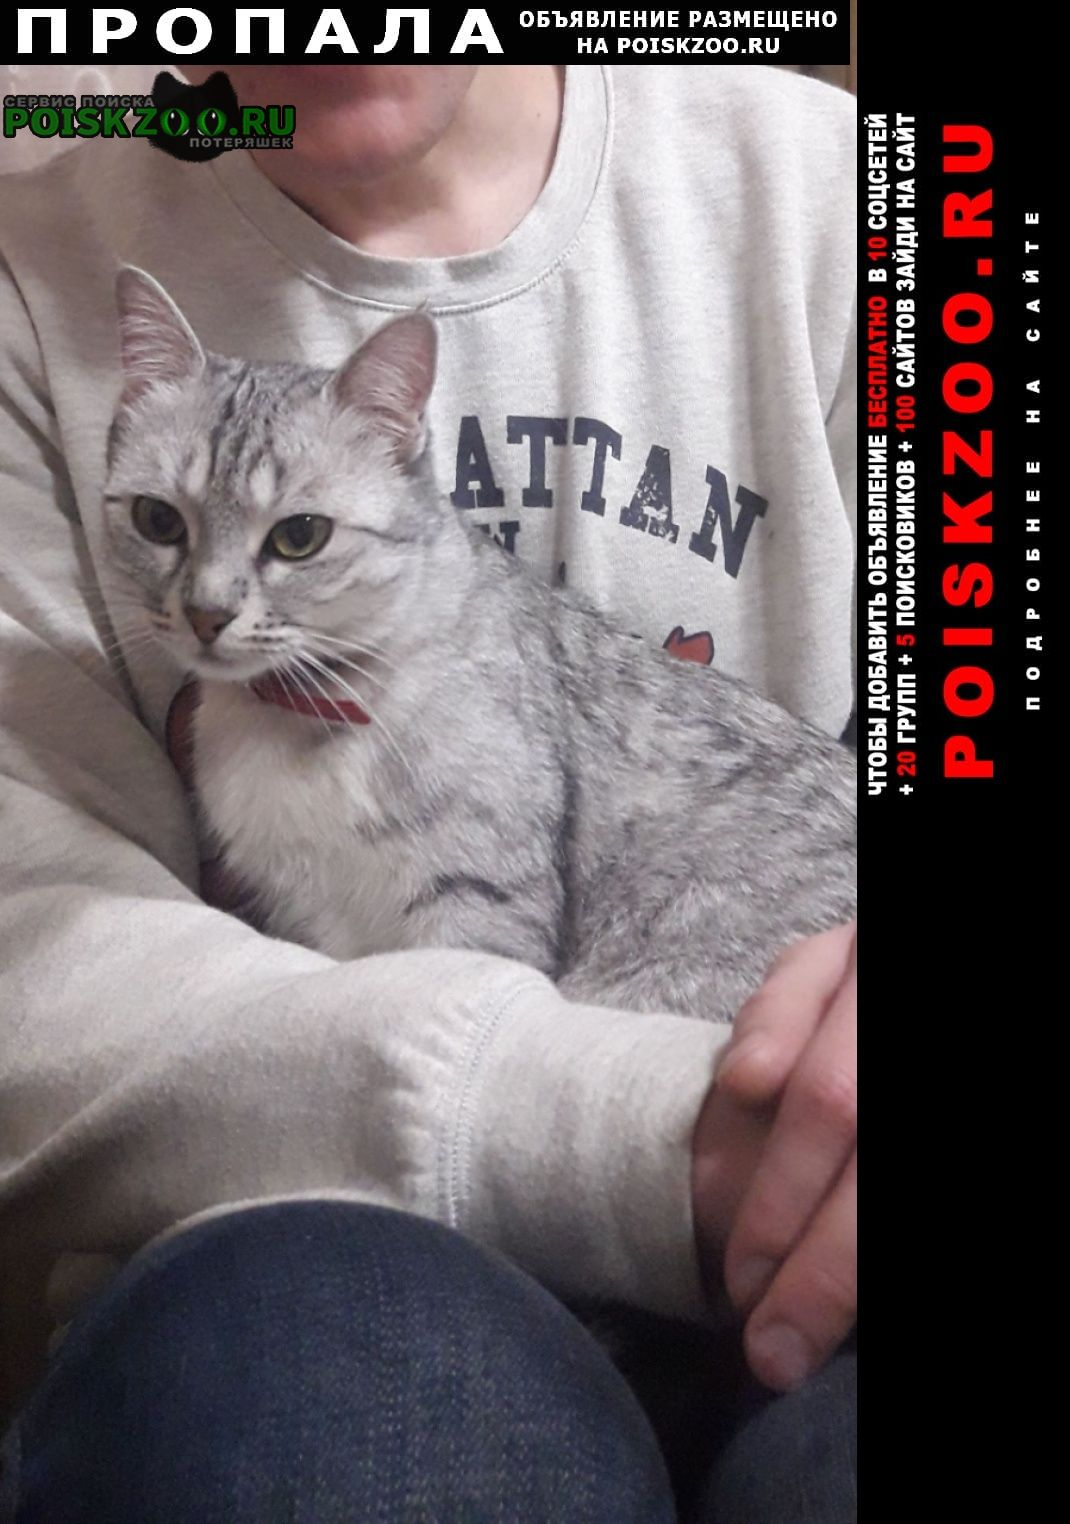 Пропала кошка поселок российский г.Краснодар